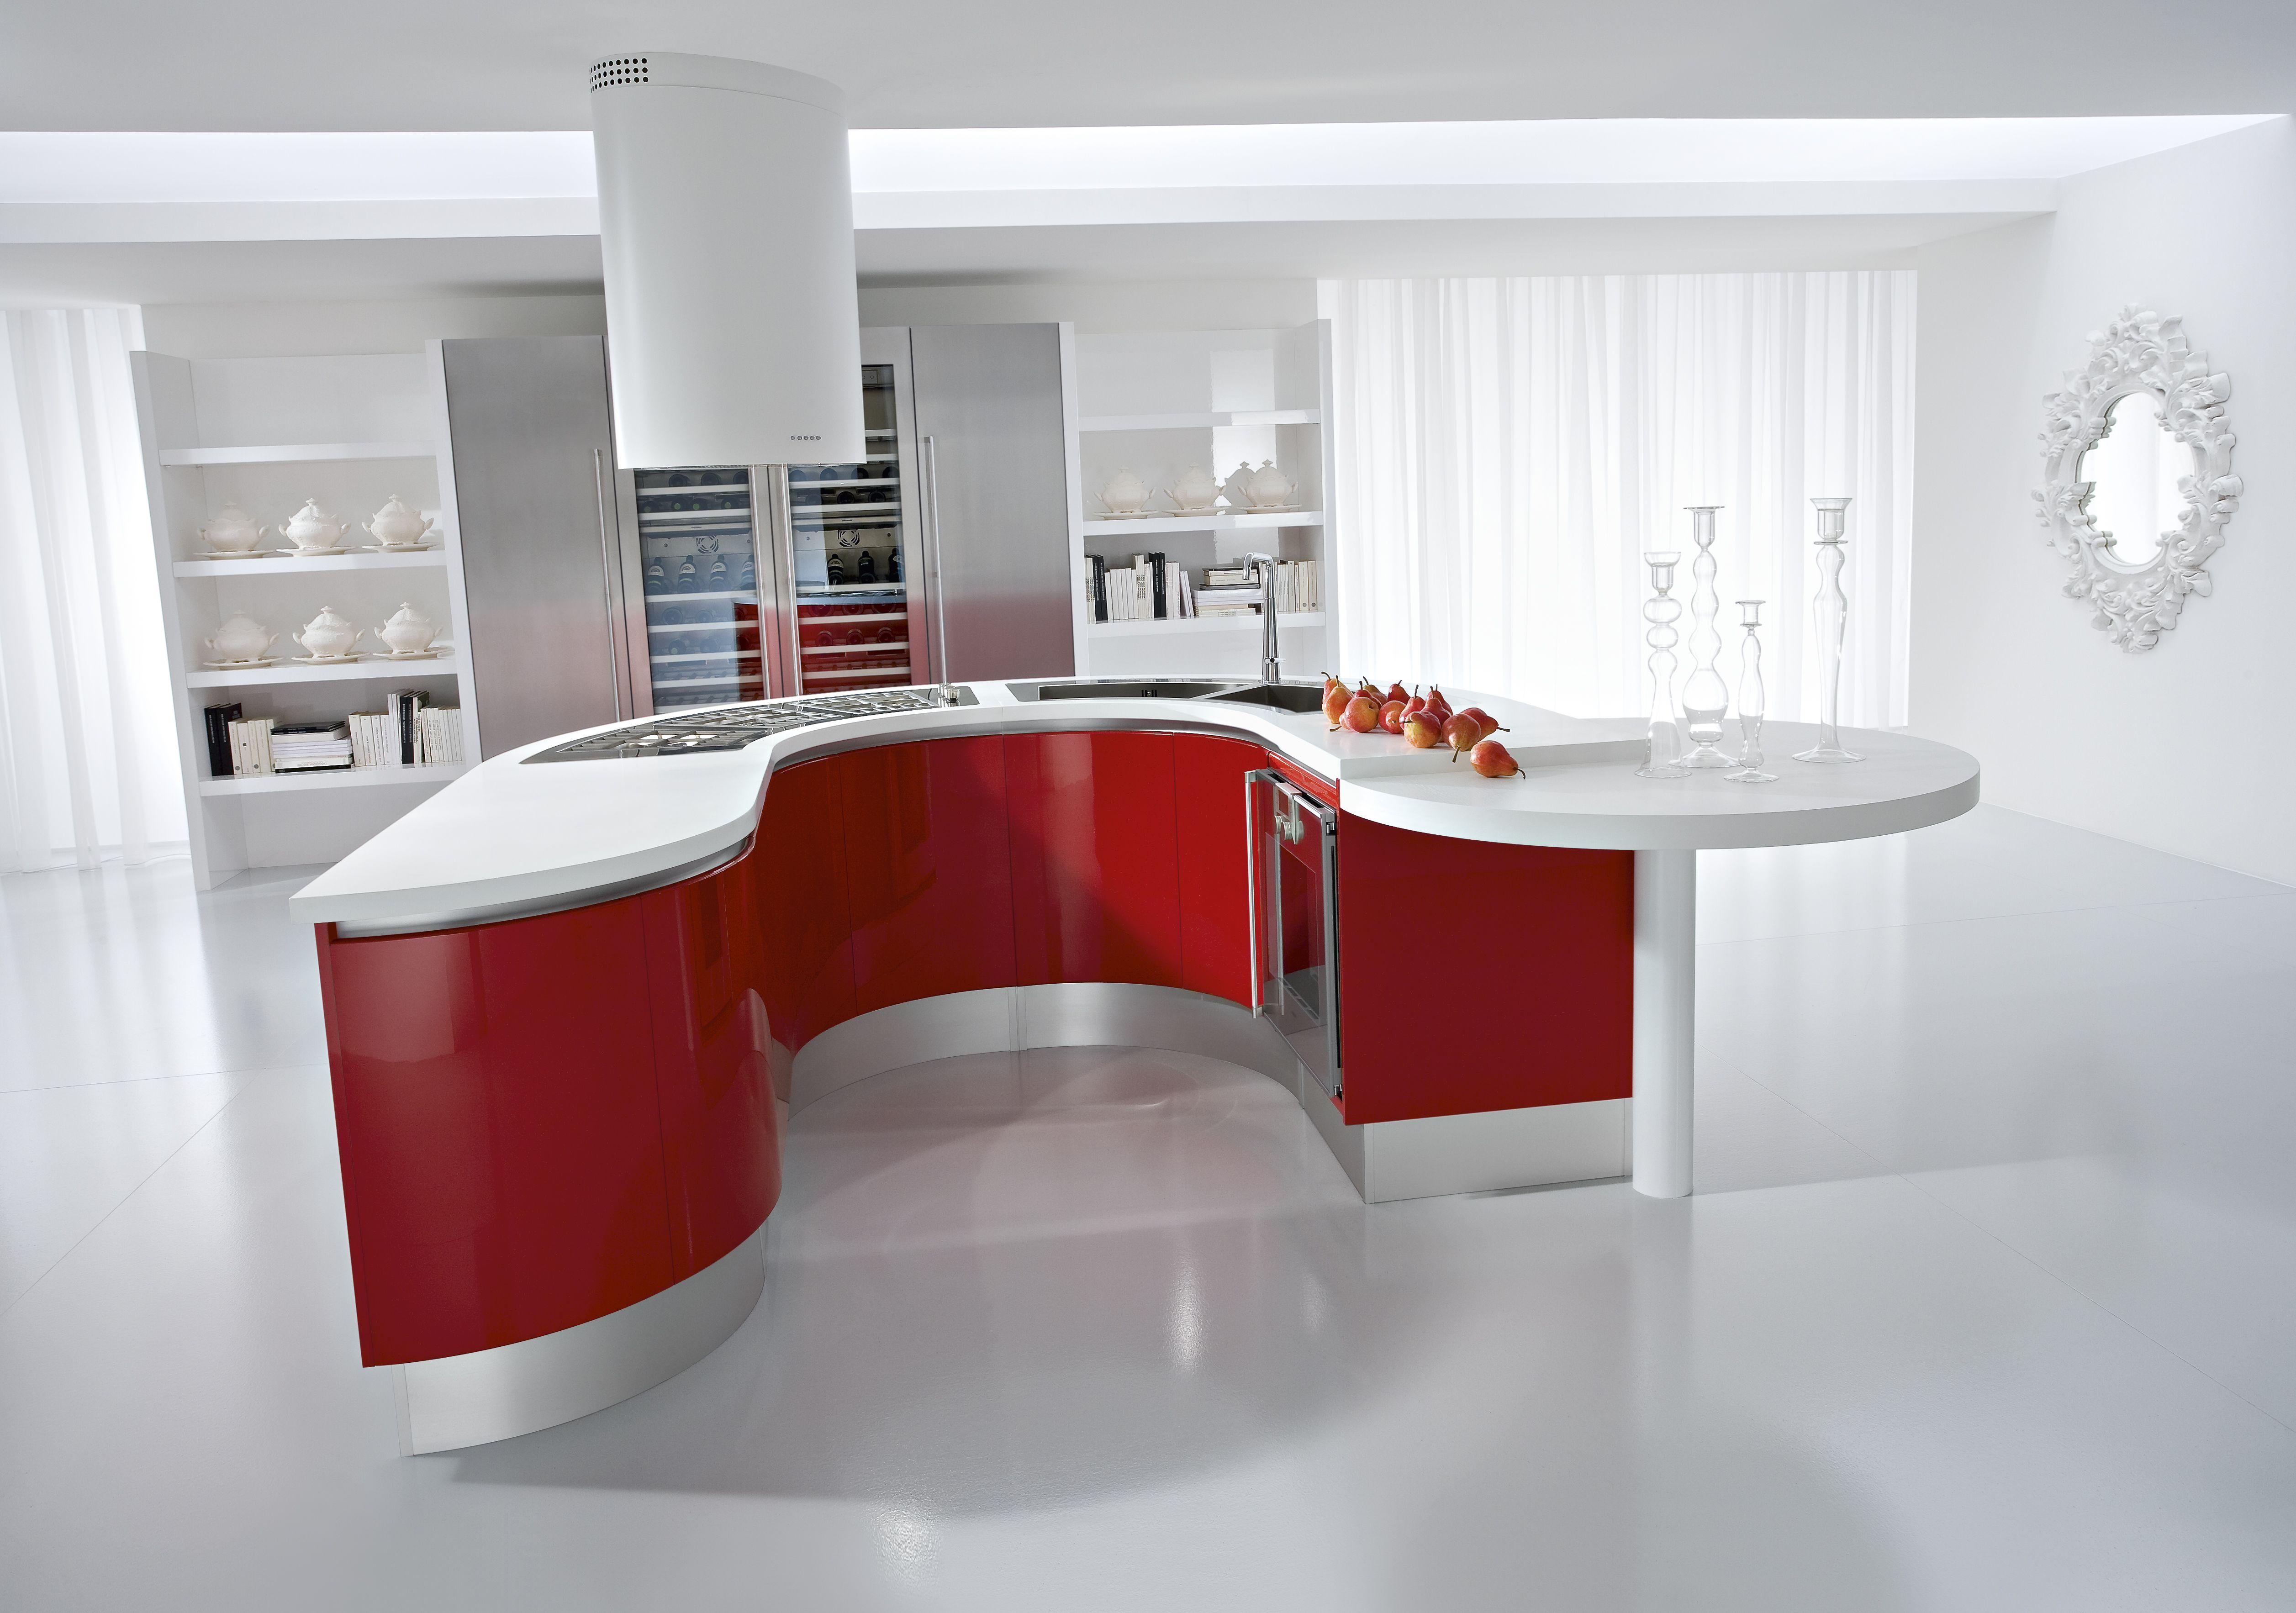 Artika kitchen design nyc sensual and curvy let artika take